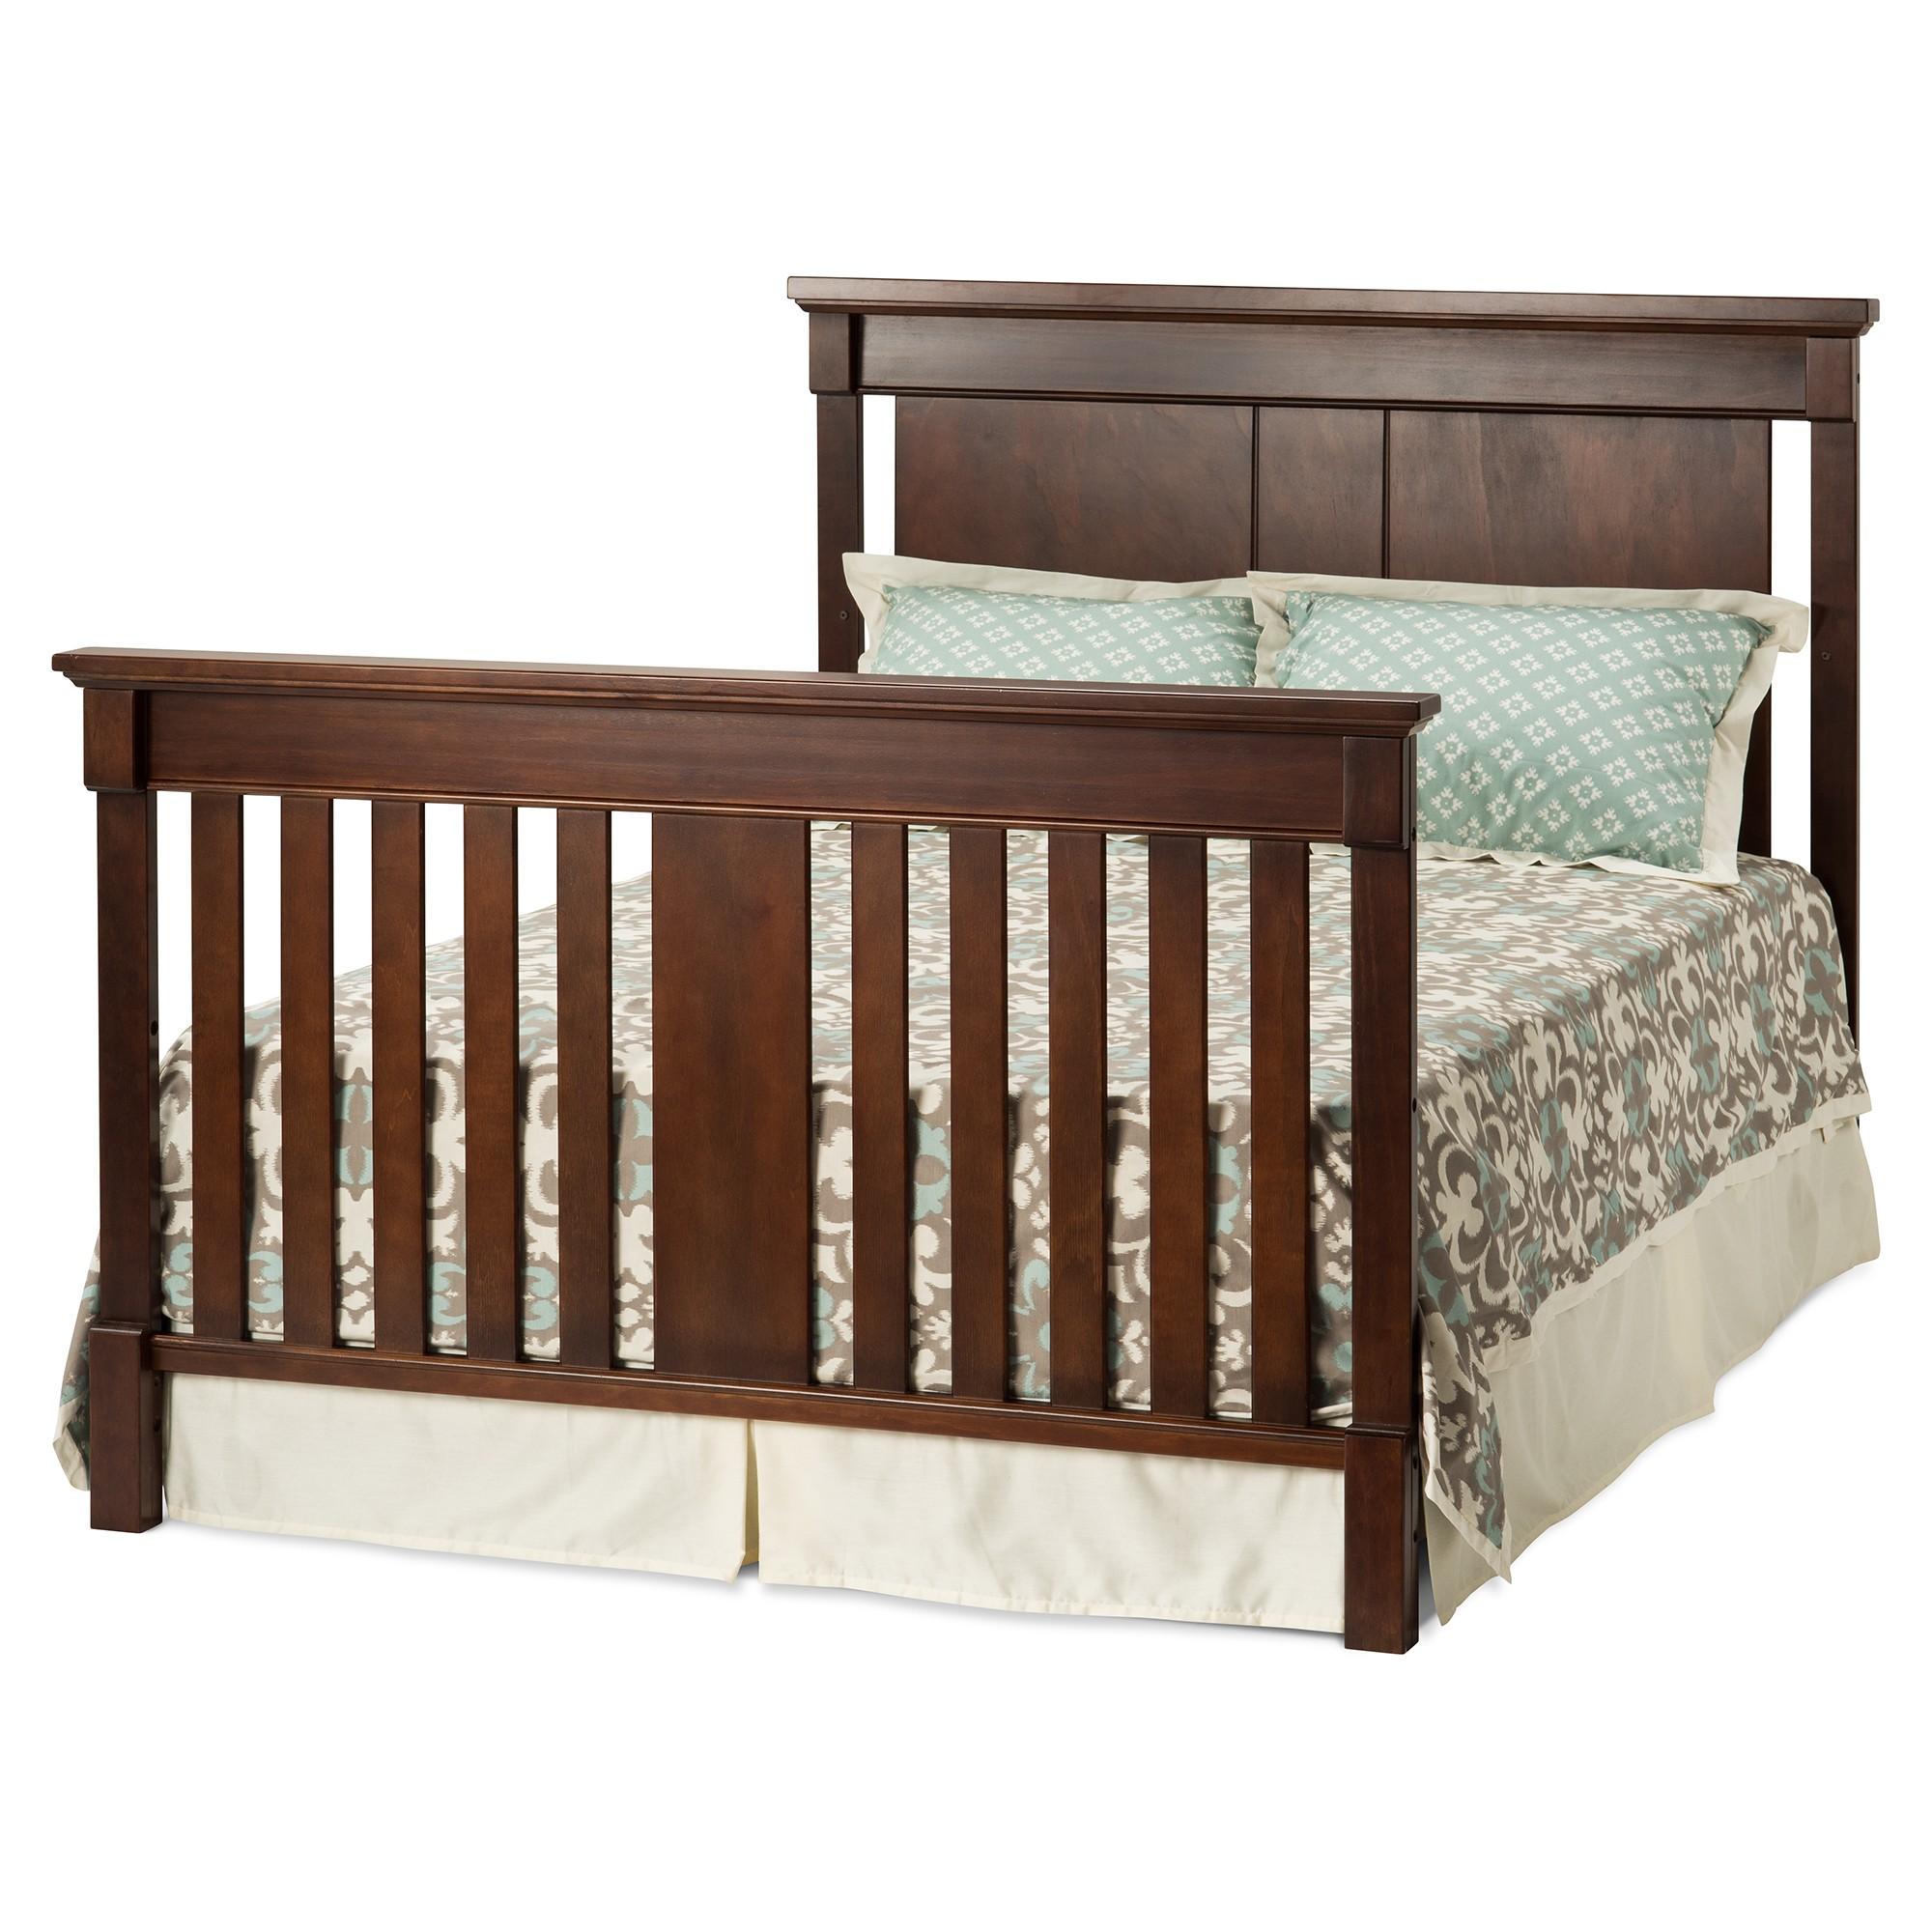 Bradford 4 In 1 Convertible Crib Child Craft